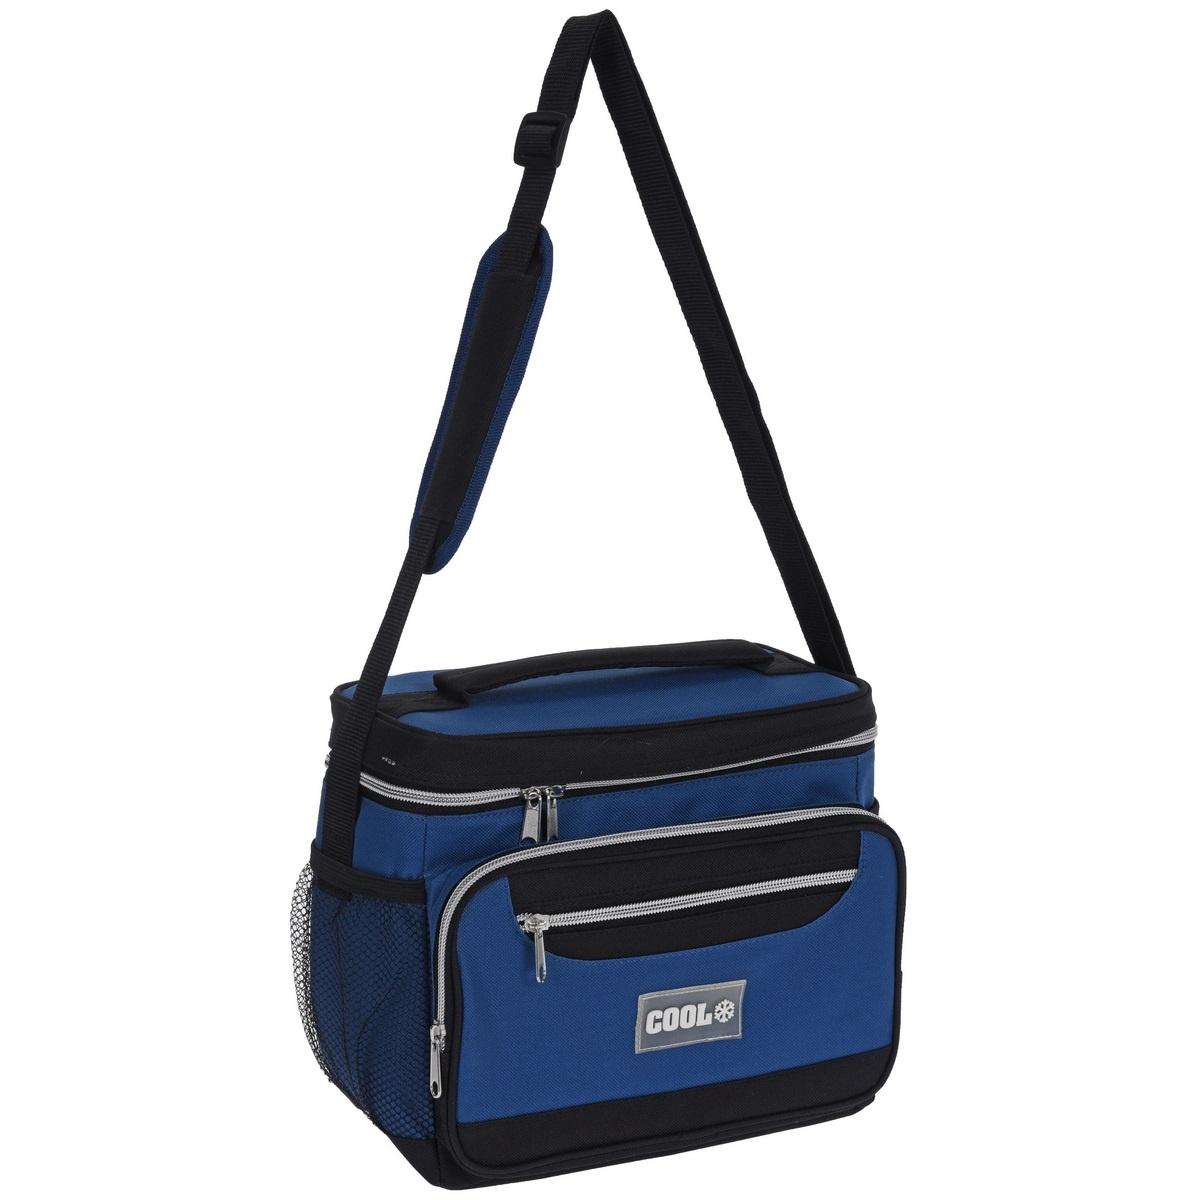 188a317c11 Koopman Chladiaca taška Cool breeze modrá